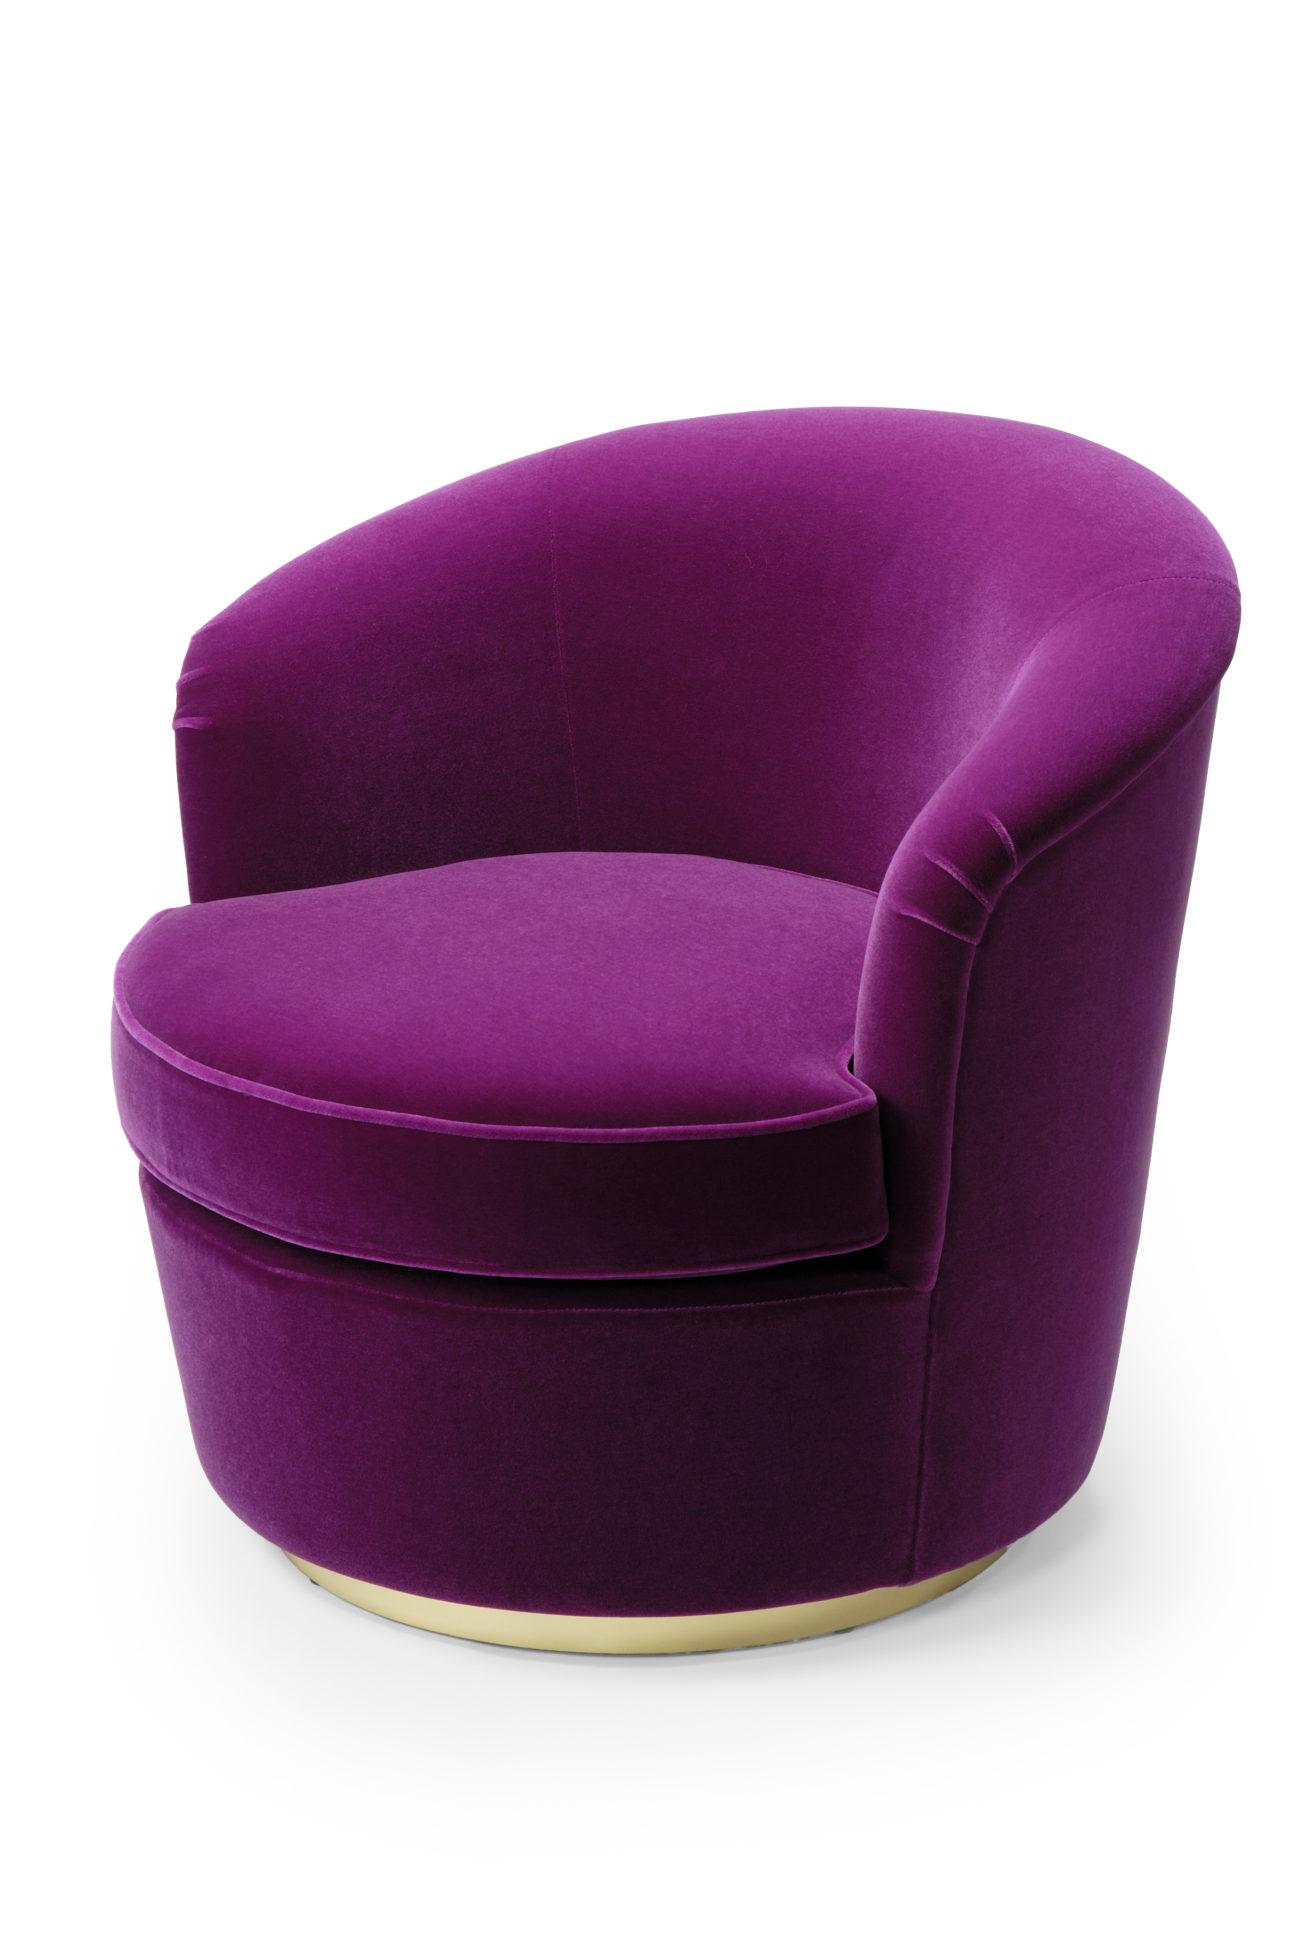 Floradora Swivel Chair Amy Somerville London